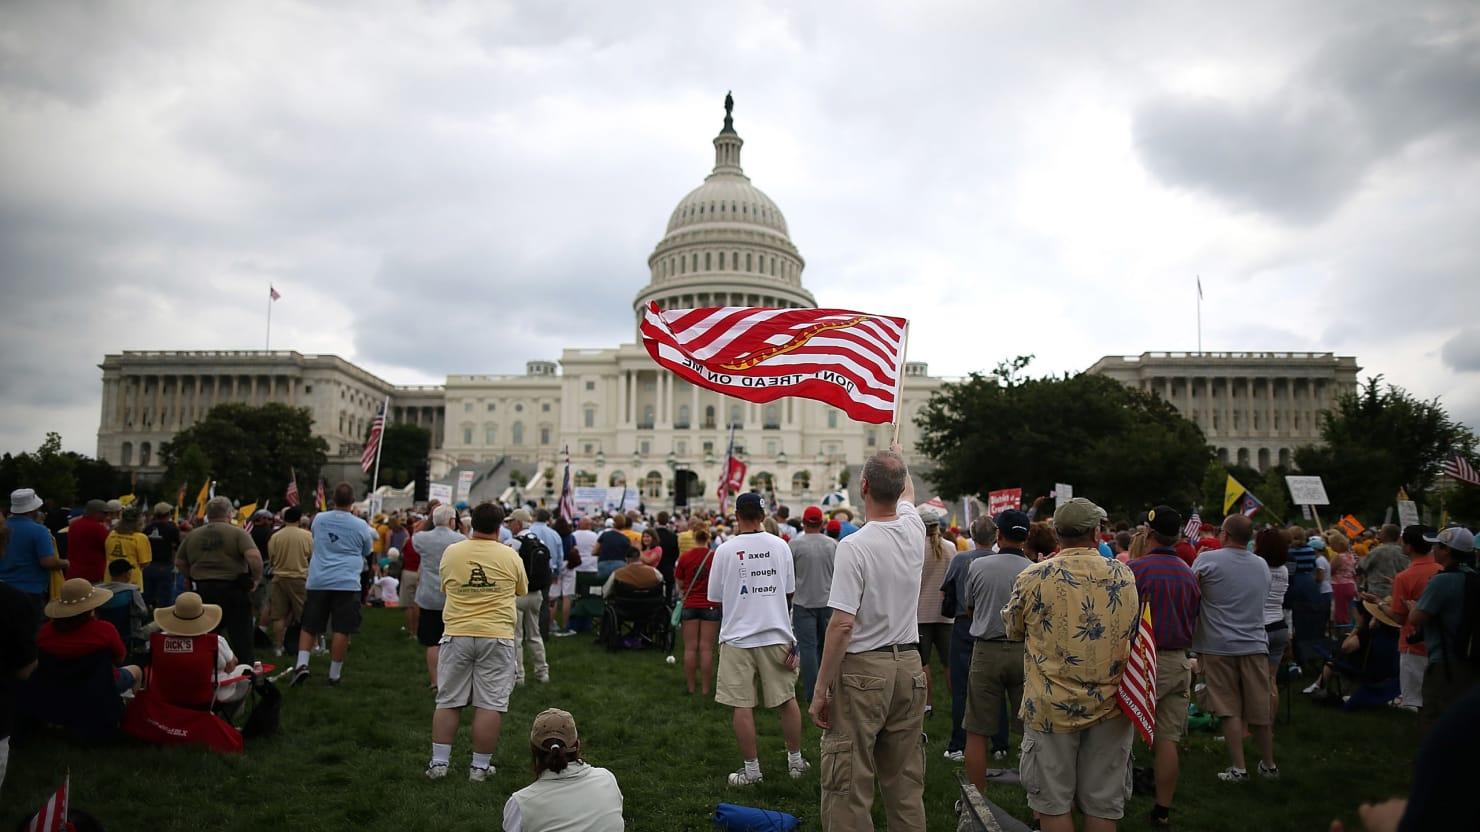 Jon Favreau on the Destructive Rise of the No-Government Conservatives